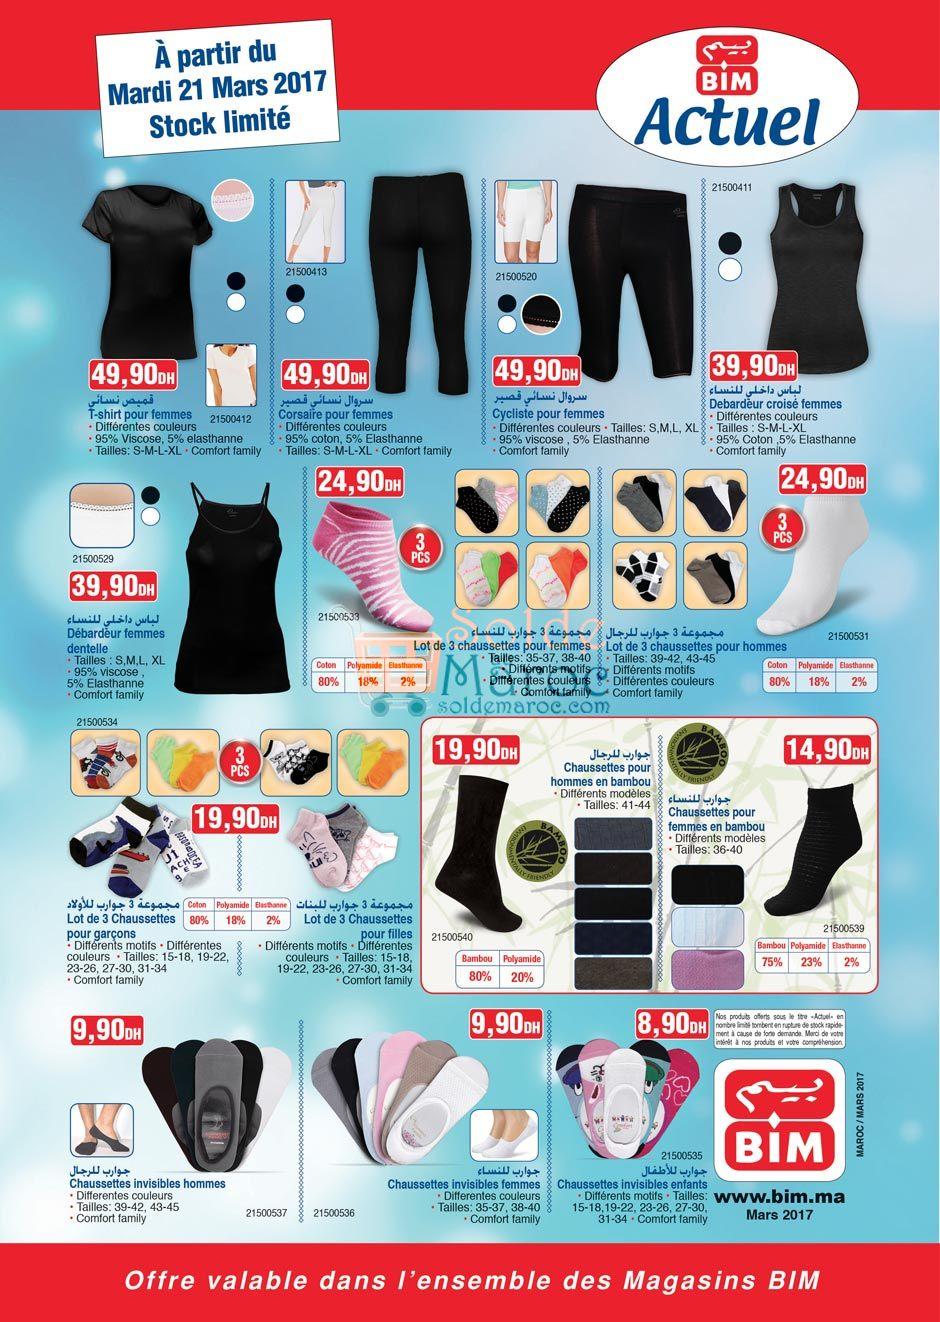 catalogue bim maroc partir du mardi 21 mars 2017 solde et promotion du maroc. Black Bedroom Furniture Sets. Home Design Ideas